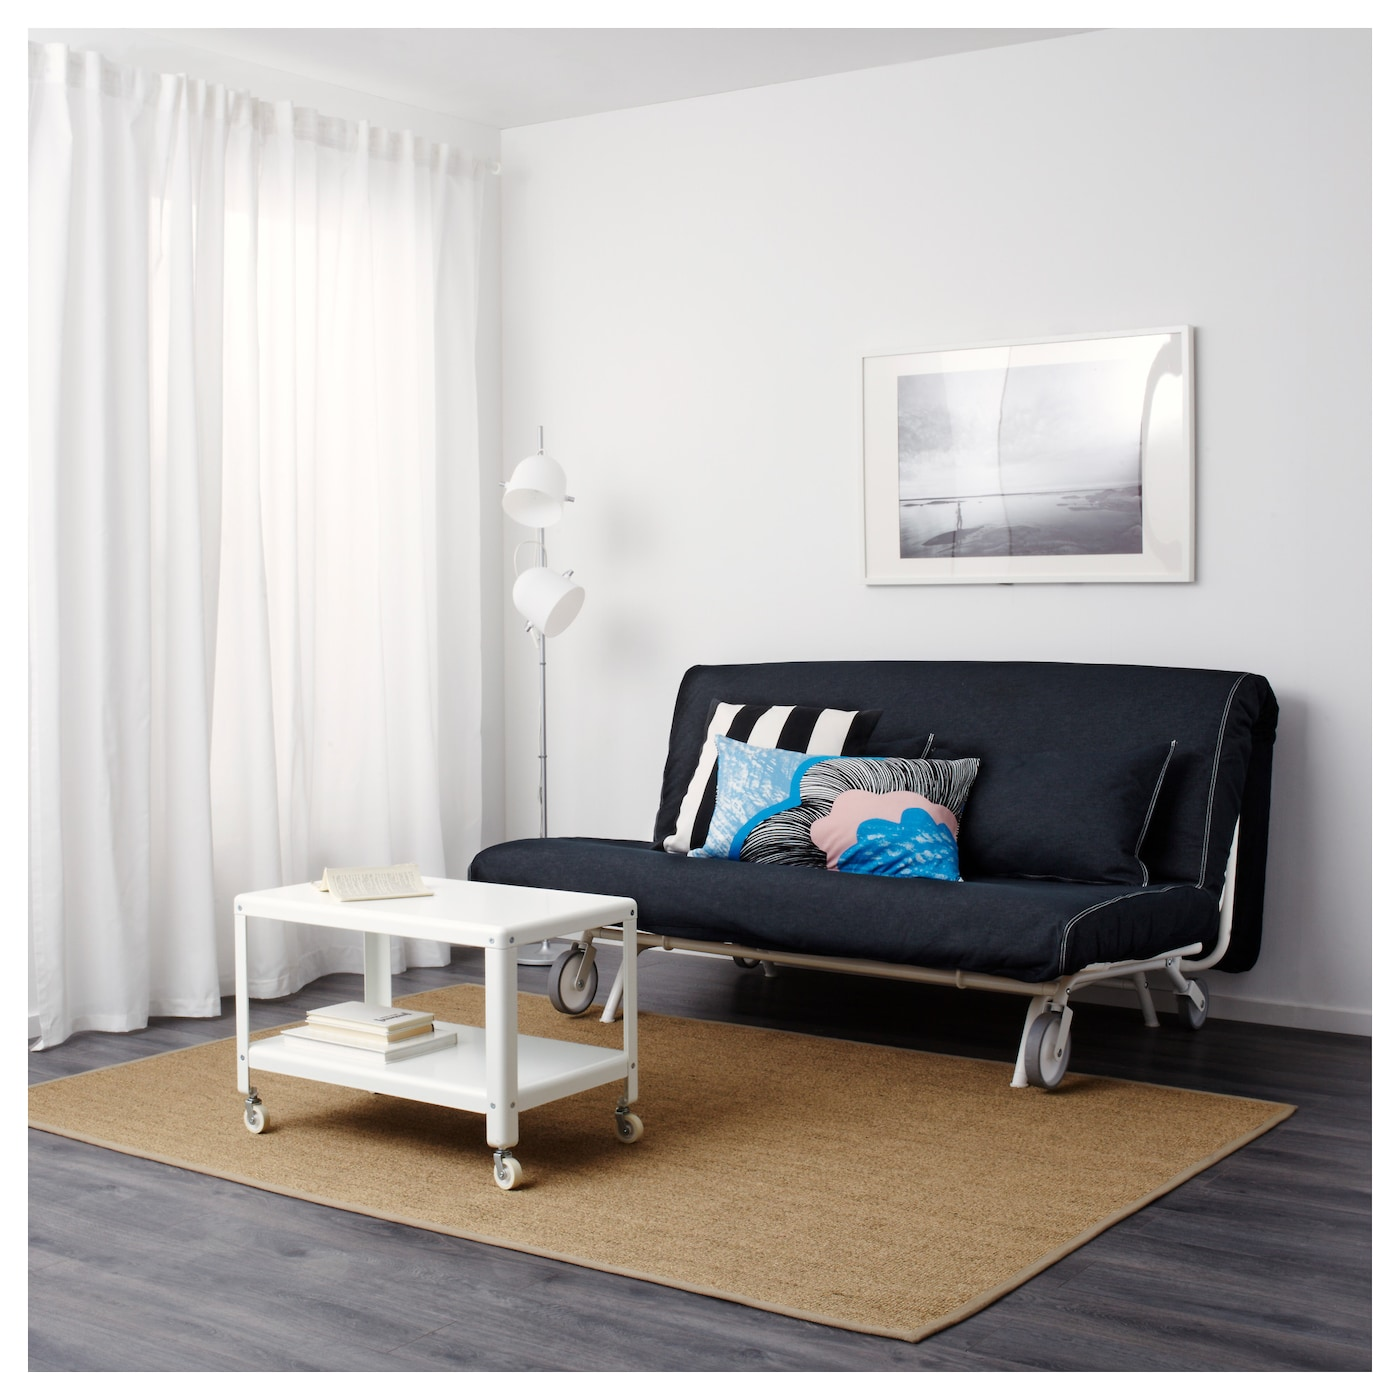 IKEA IKEA PS HÅVET Two-seat Sofa-bed